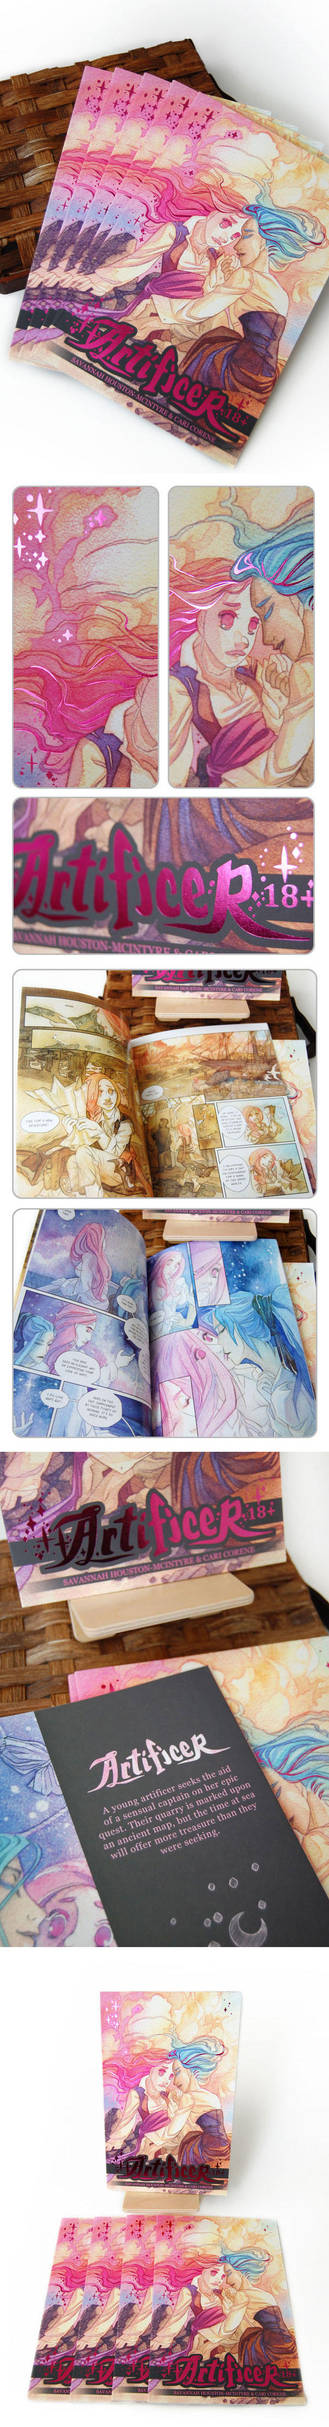 Artificer Book Photos! by blix-it